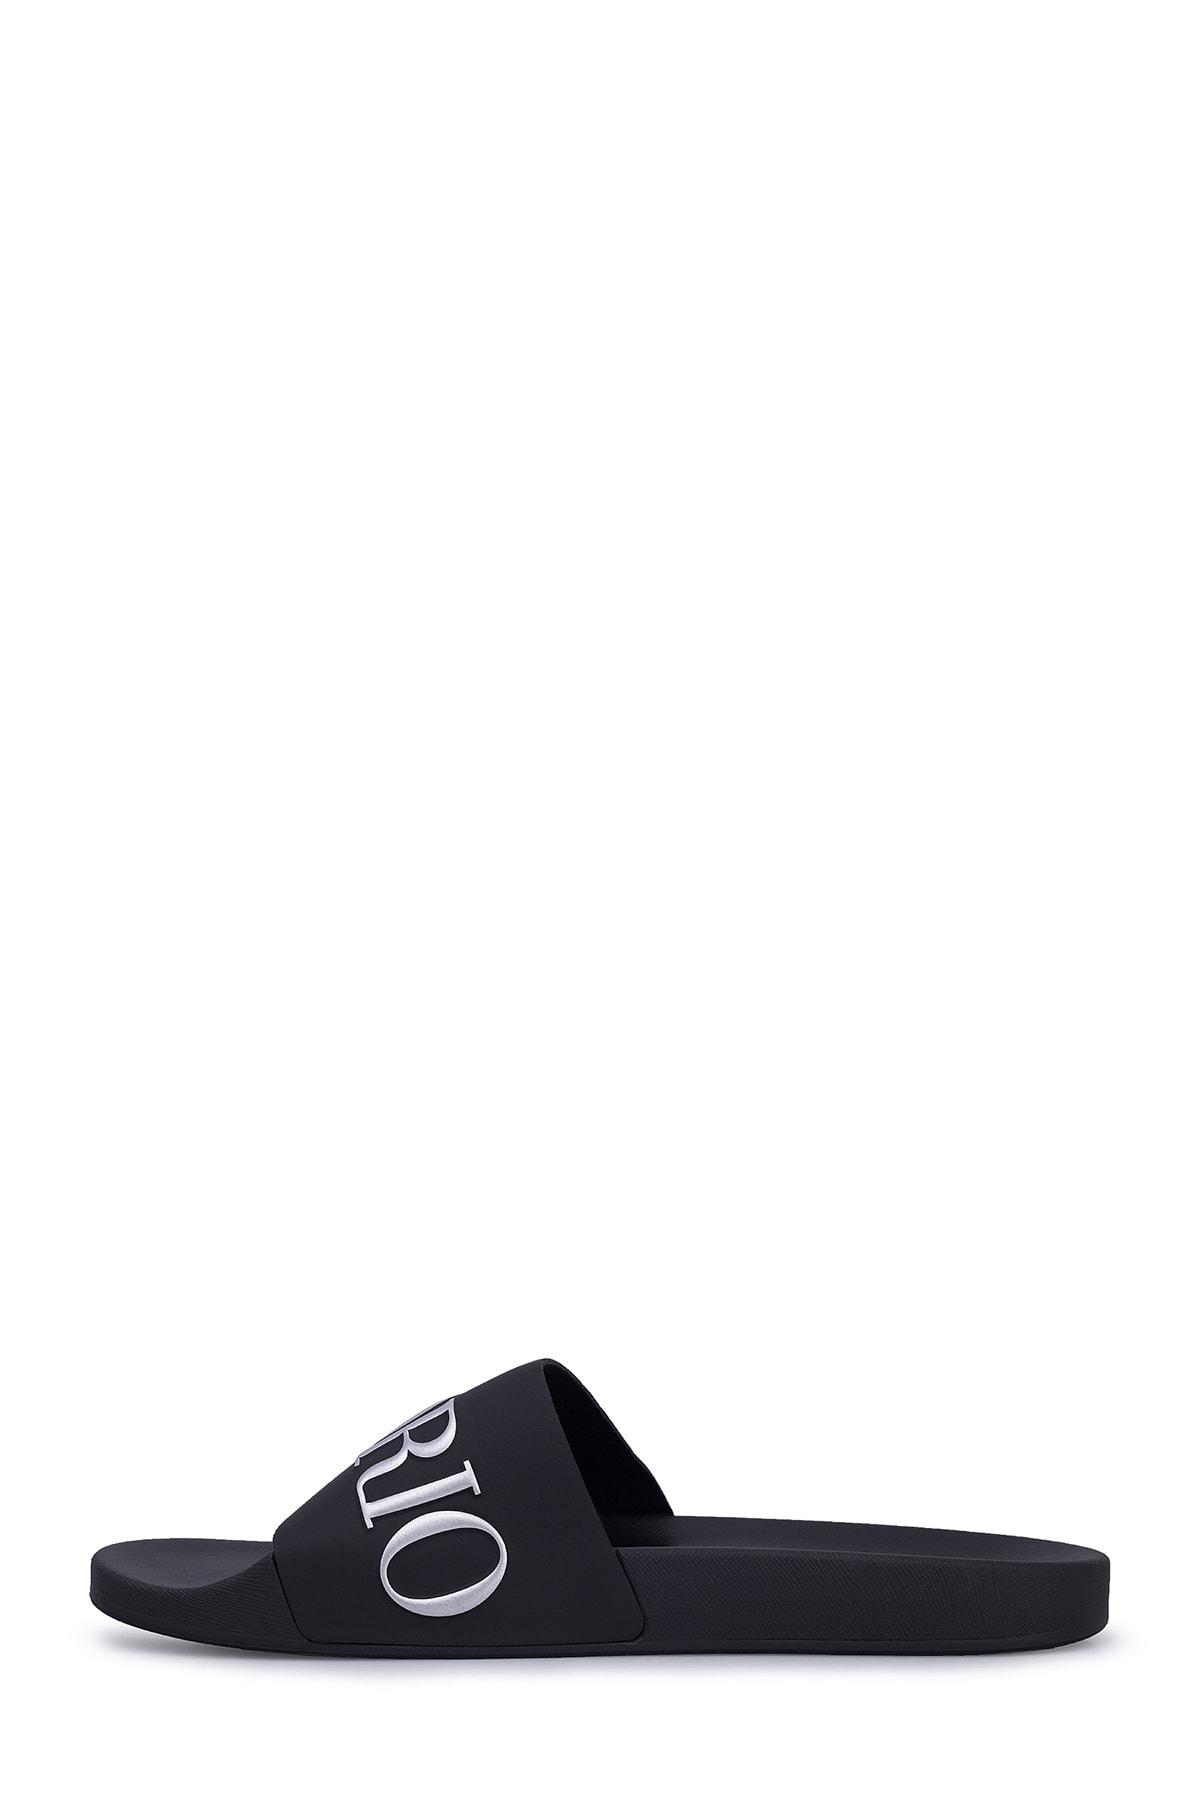 Emporio Armani Erkek Siyah Yazılı Terlik X4ps04 Xm291 M596 2